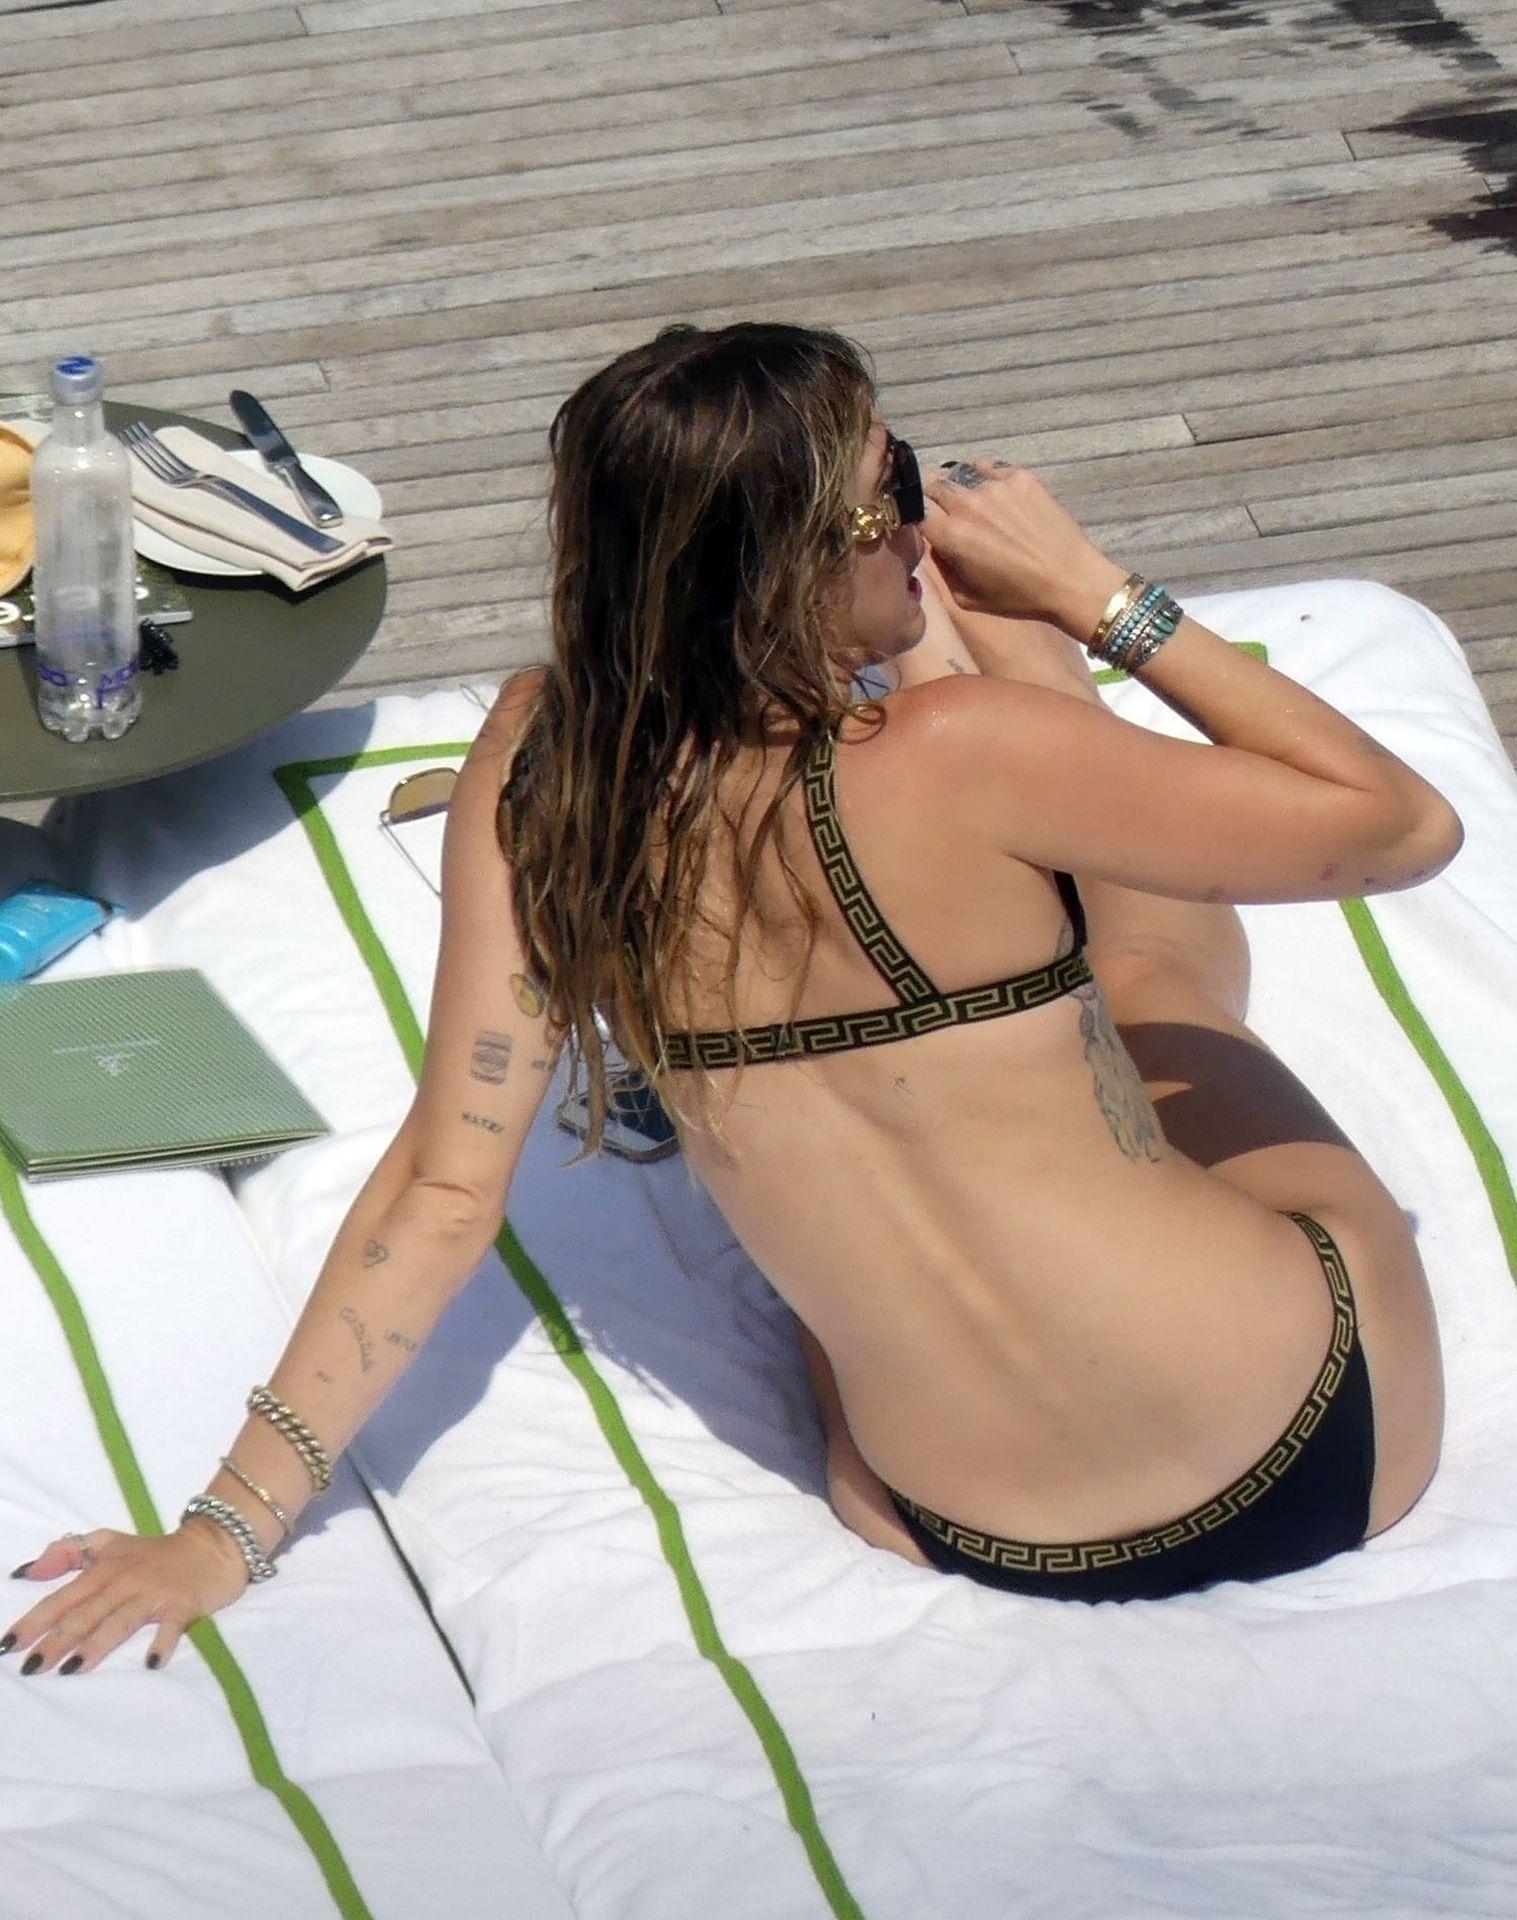 0713004446900_27_Miley-Cyrus-Topless-Kaitlynn-Carter-Hot-TheFappeningBlog.com-27.jpg